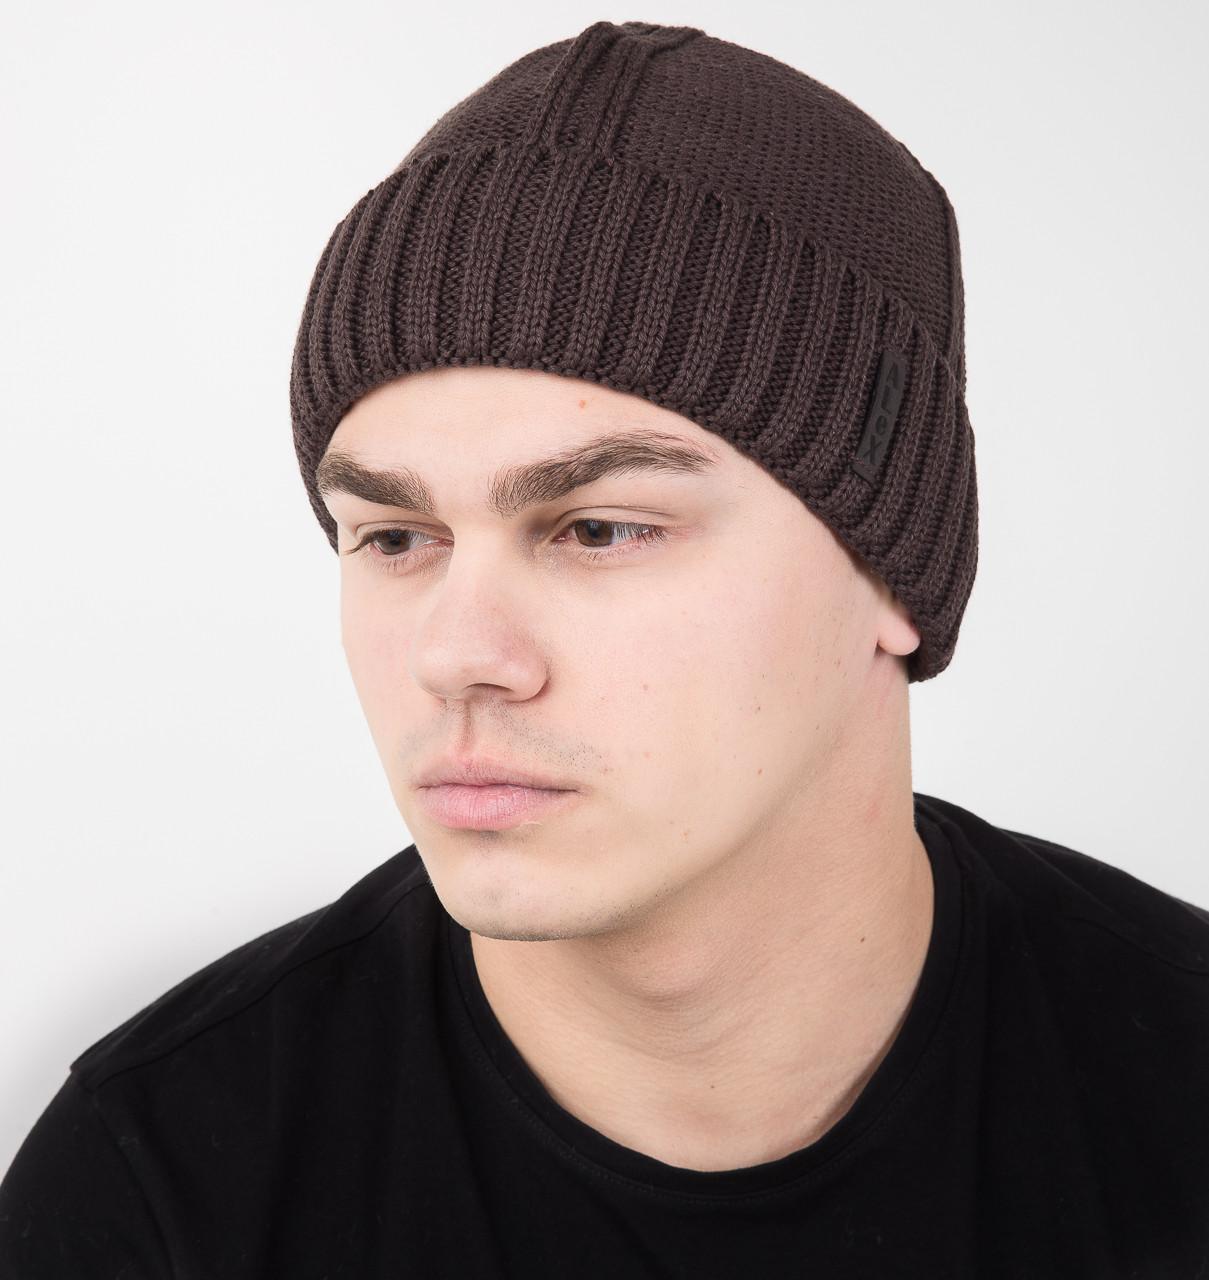 Зимняя вязаная мужская шапка на флисе (кофе) - Артикул AL17034